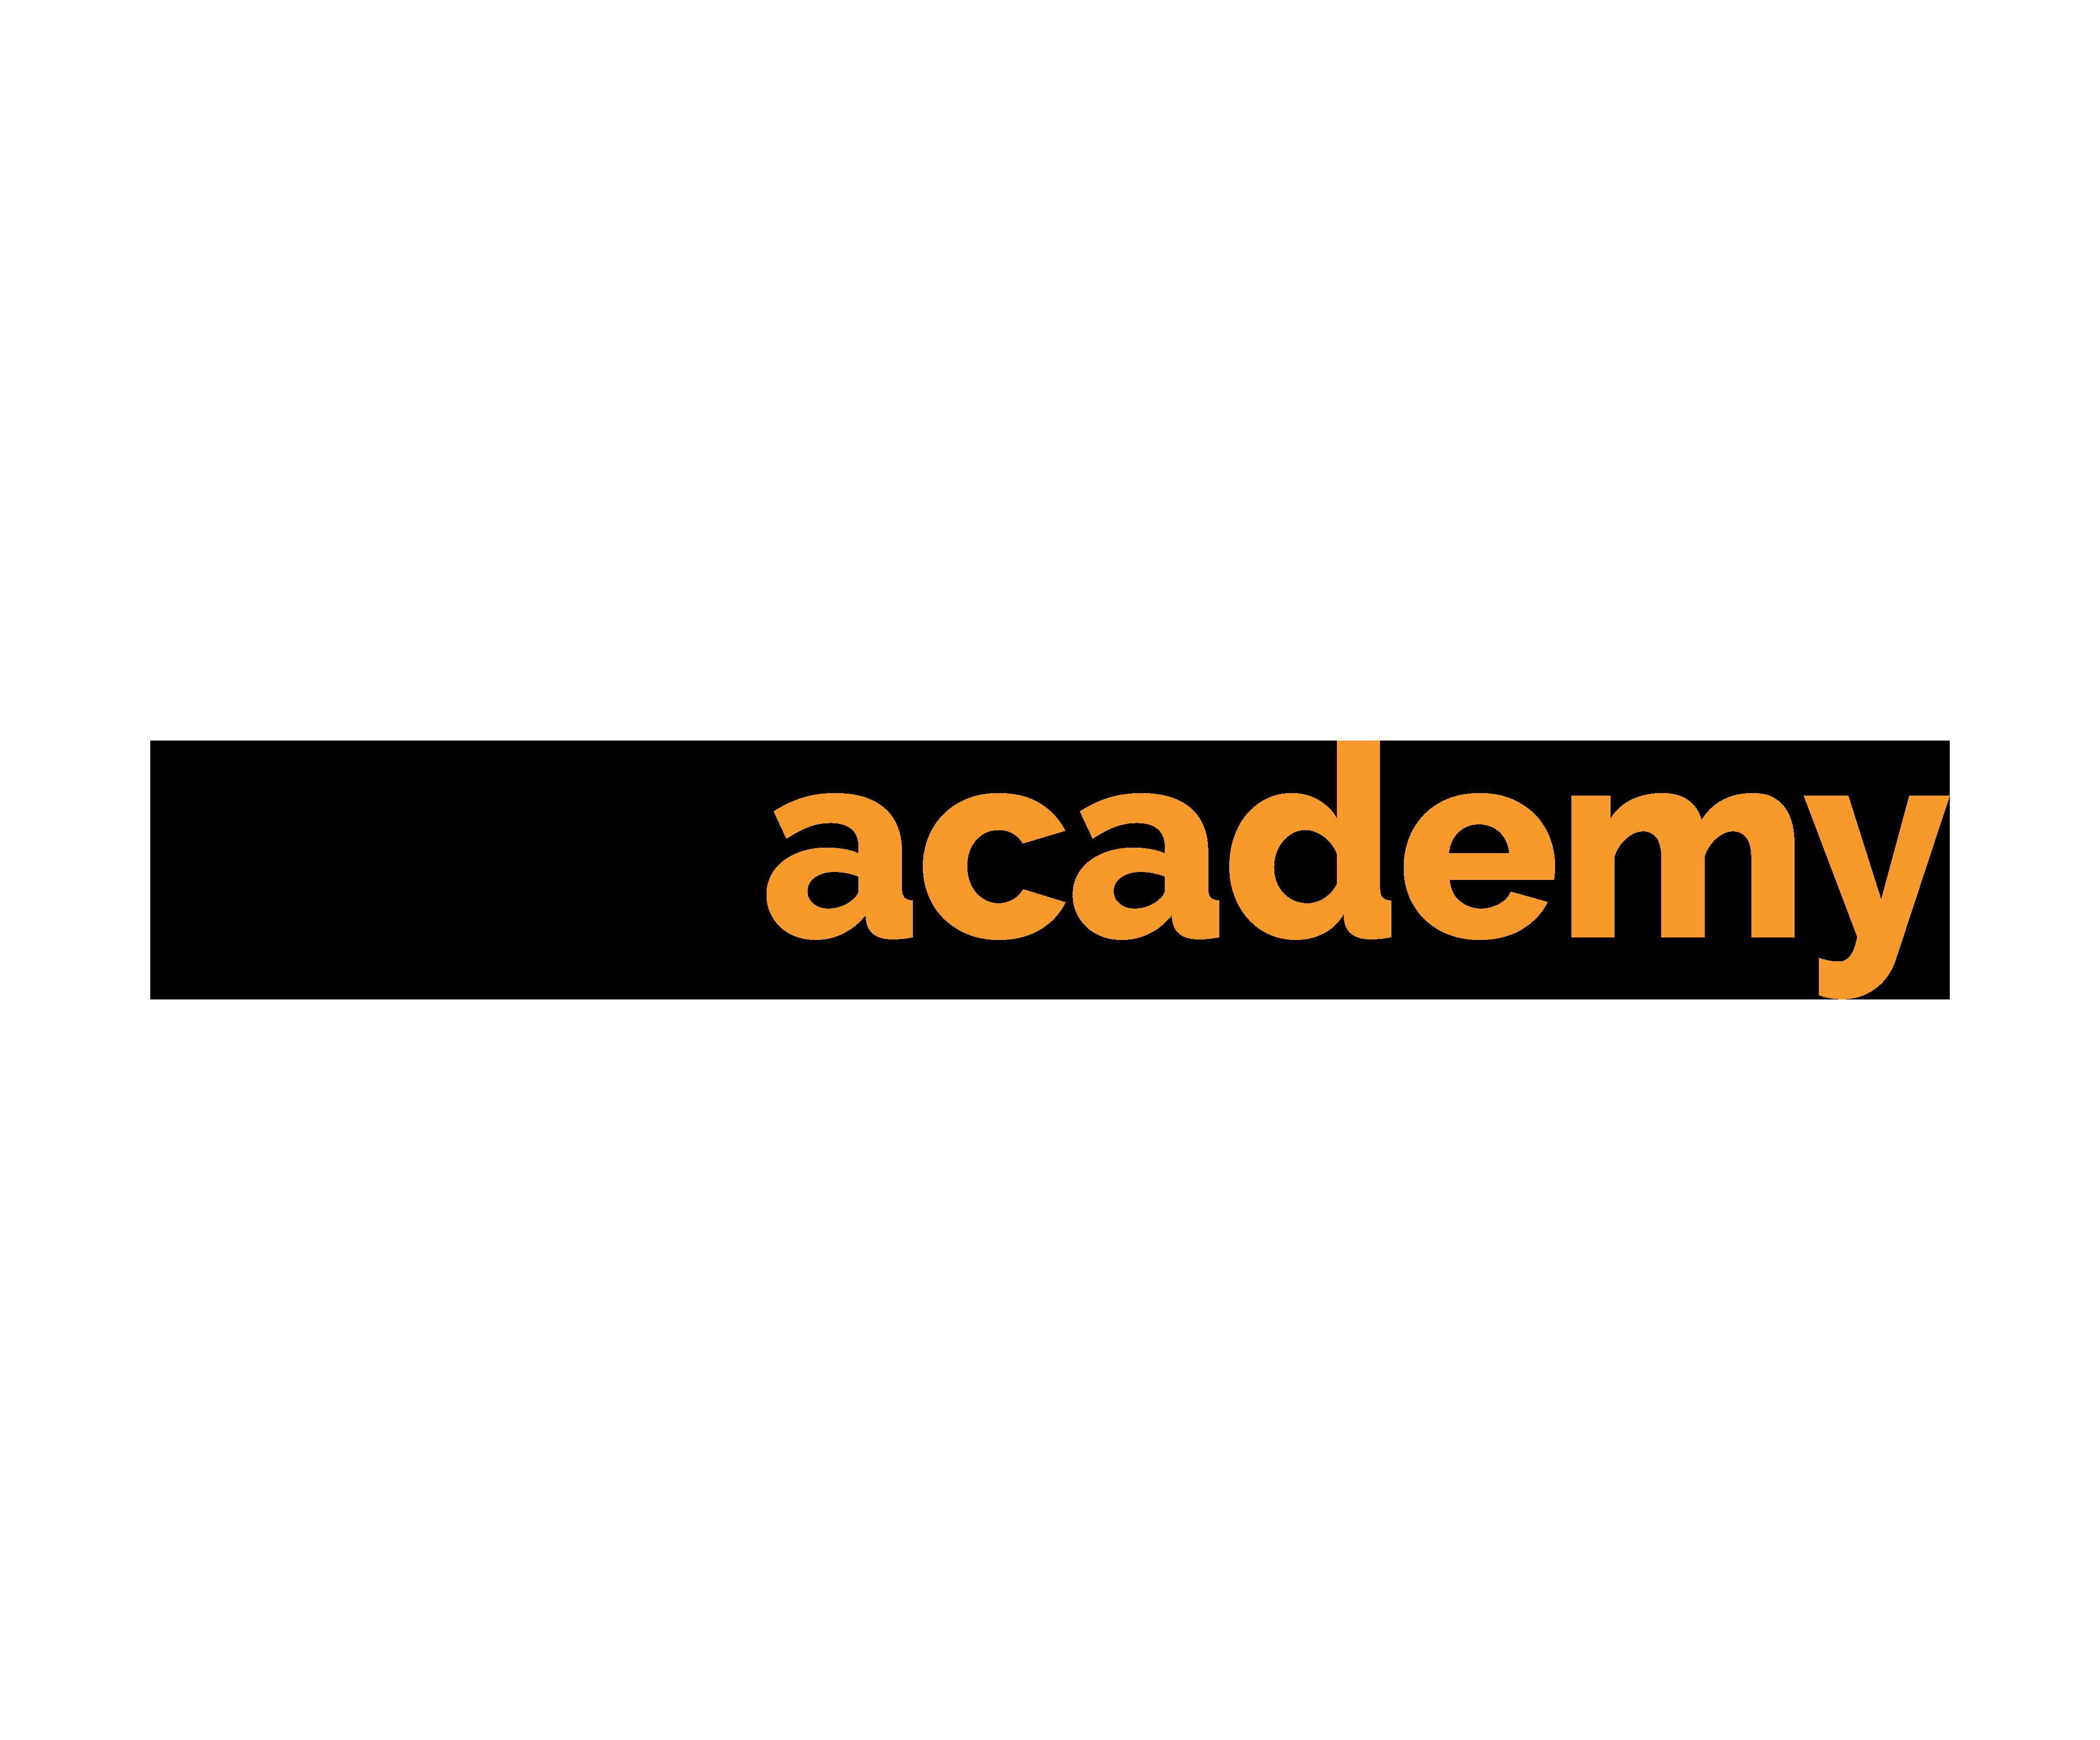 neon academy logo